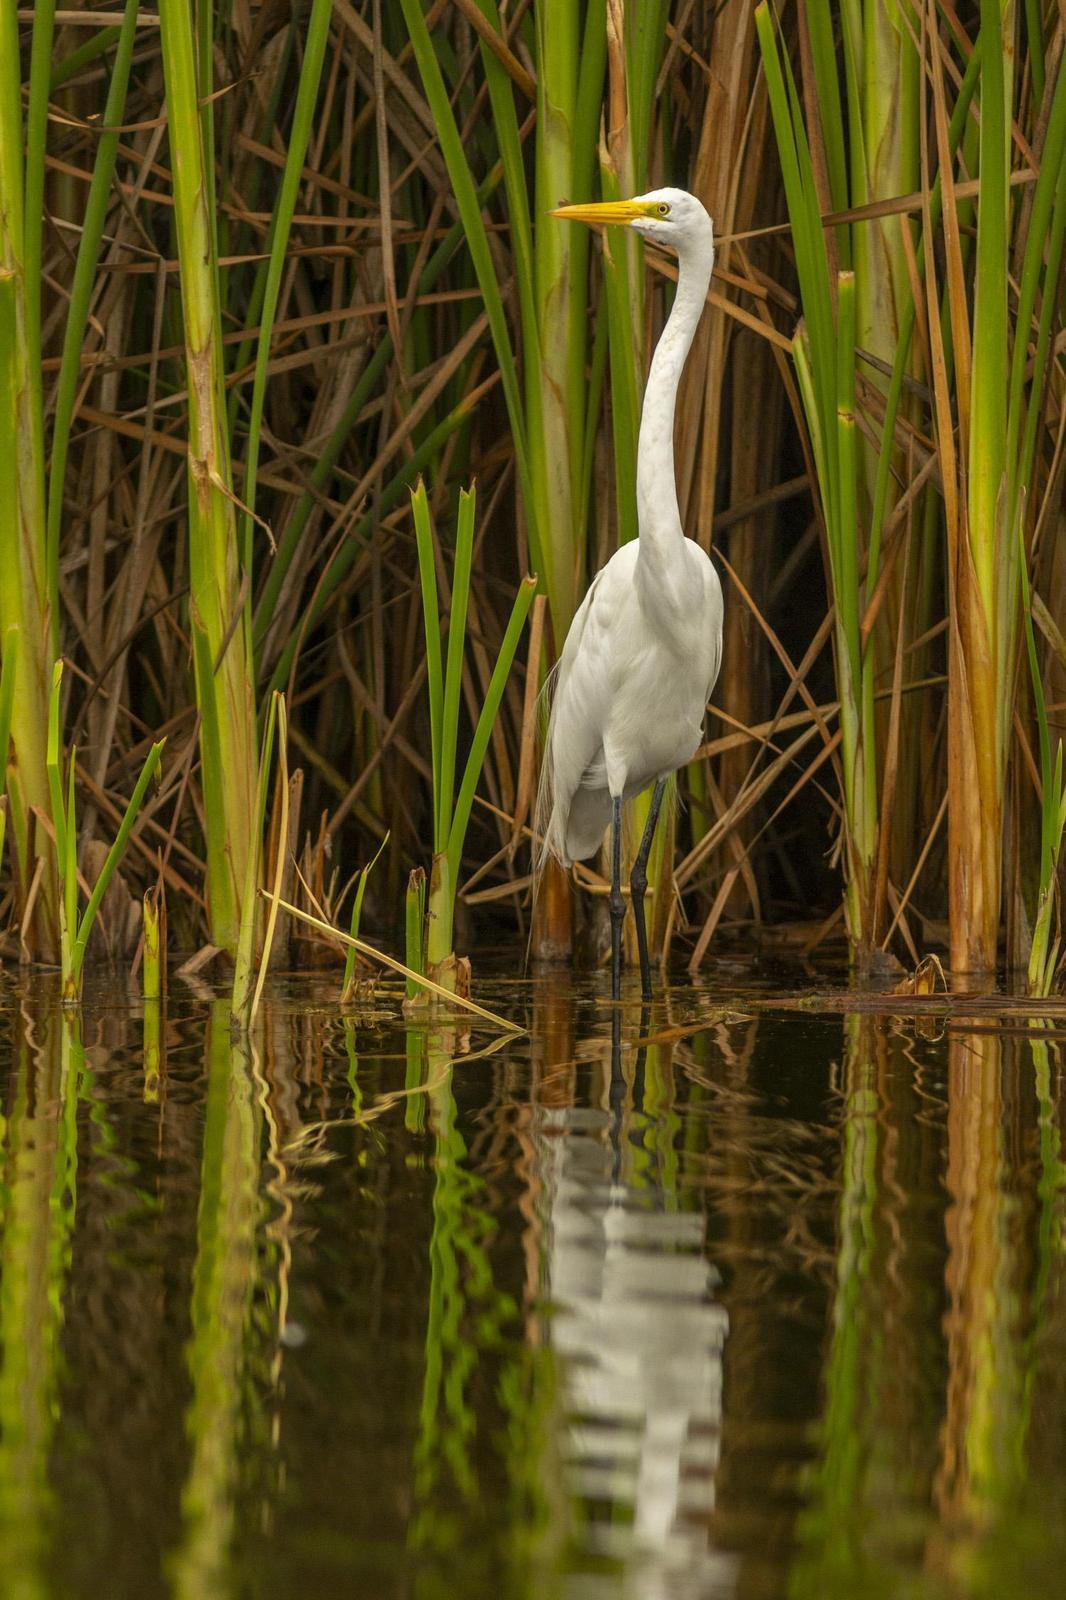 Great Egret Photo by David Rebata